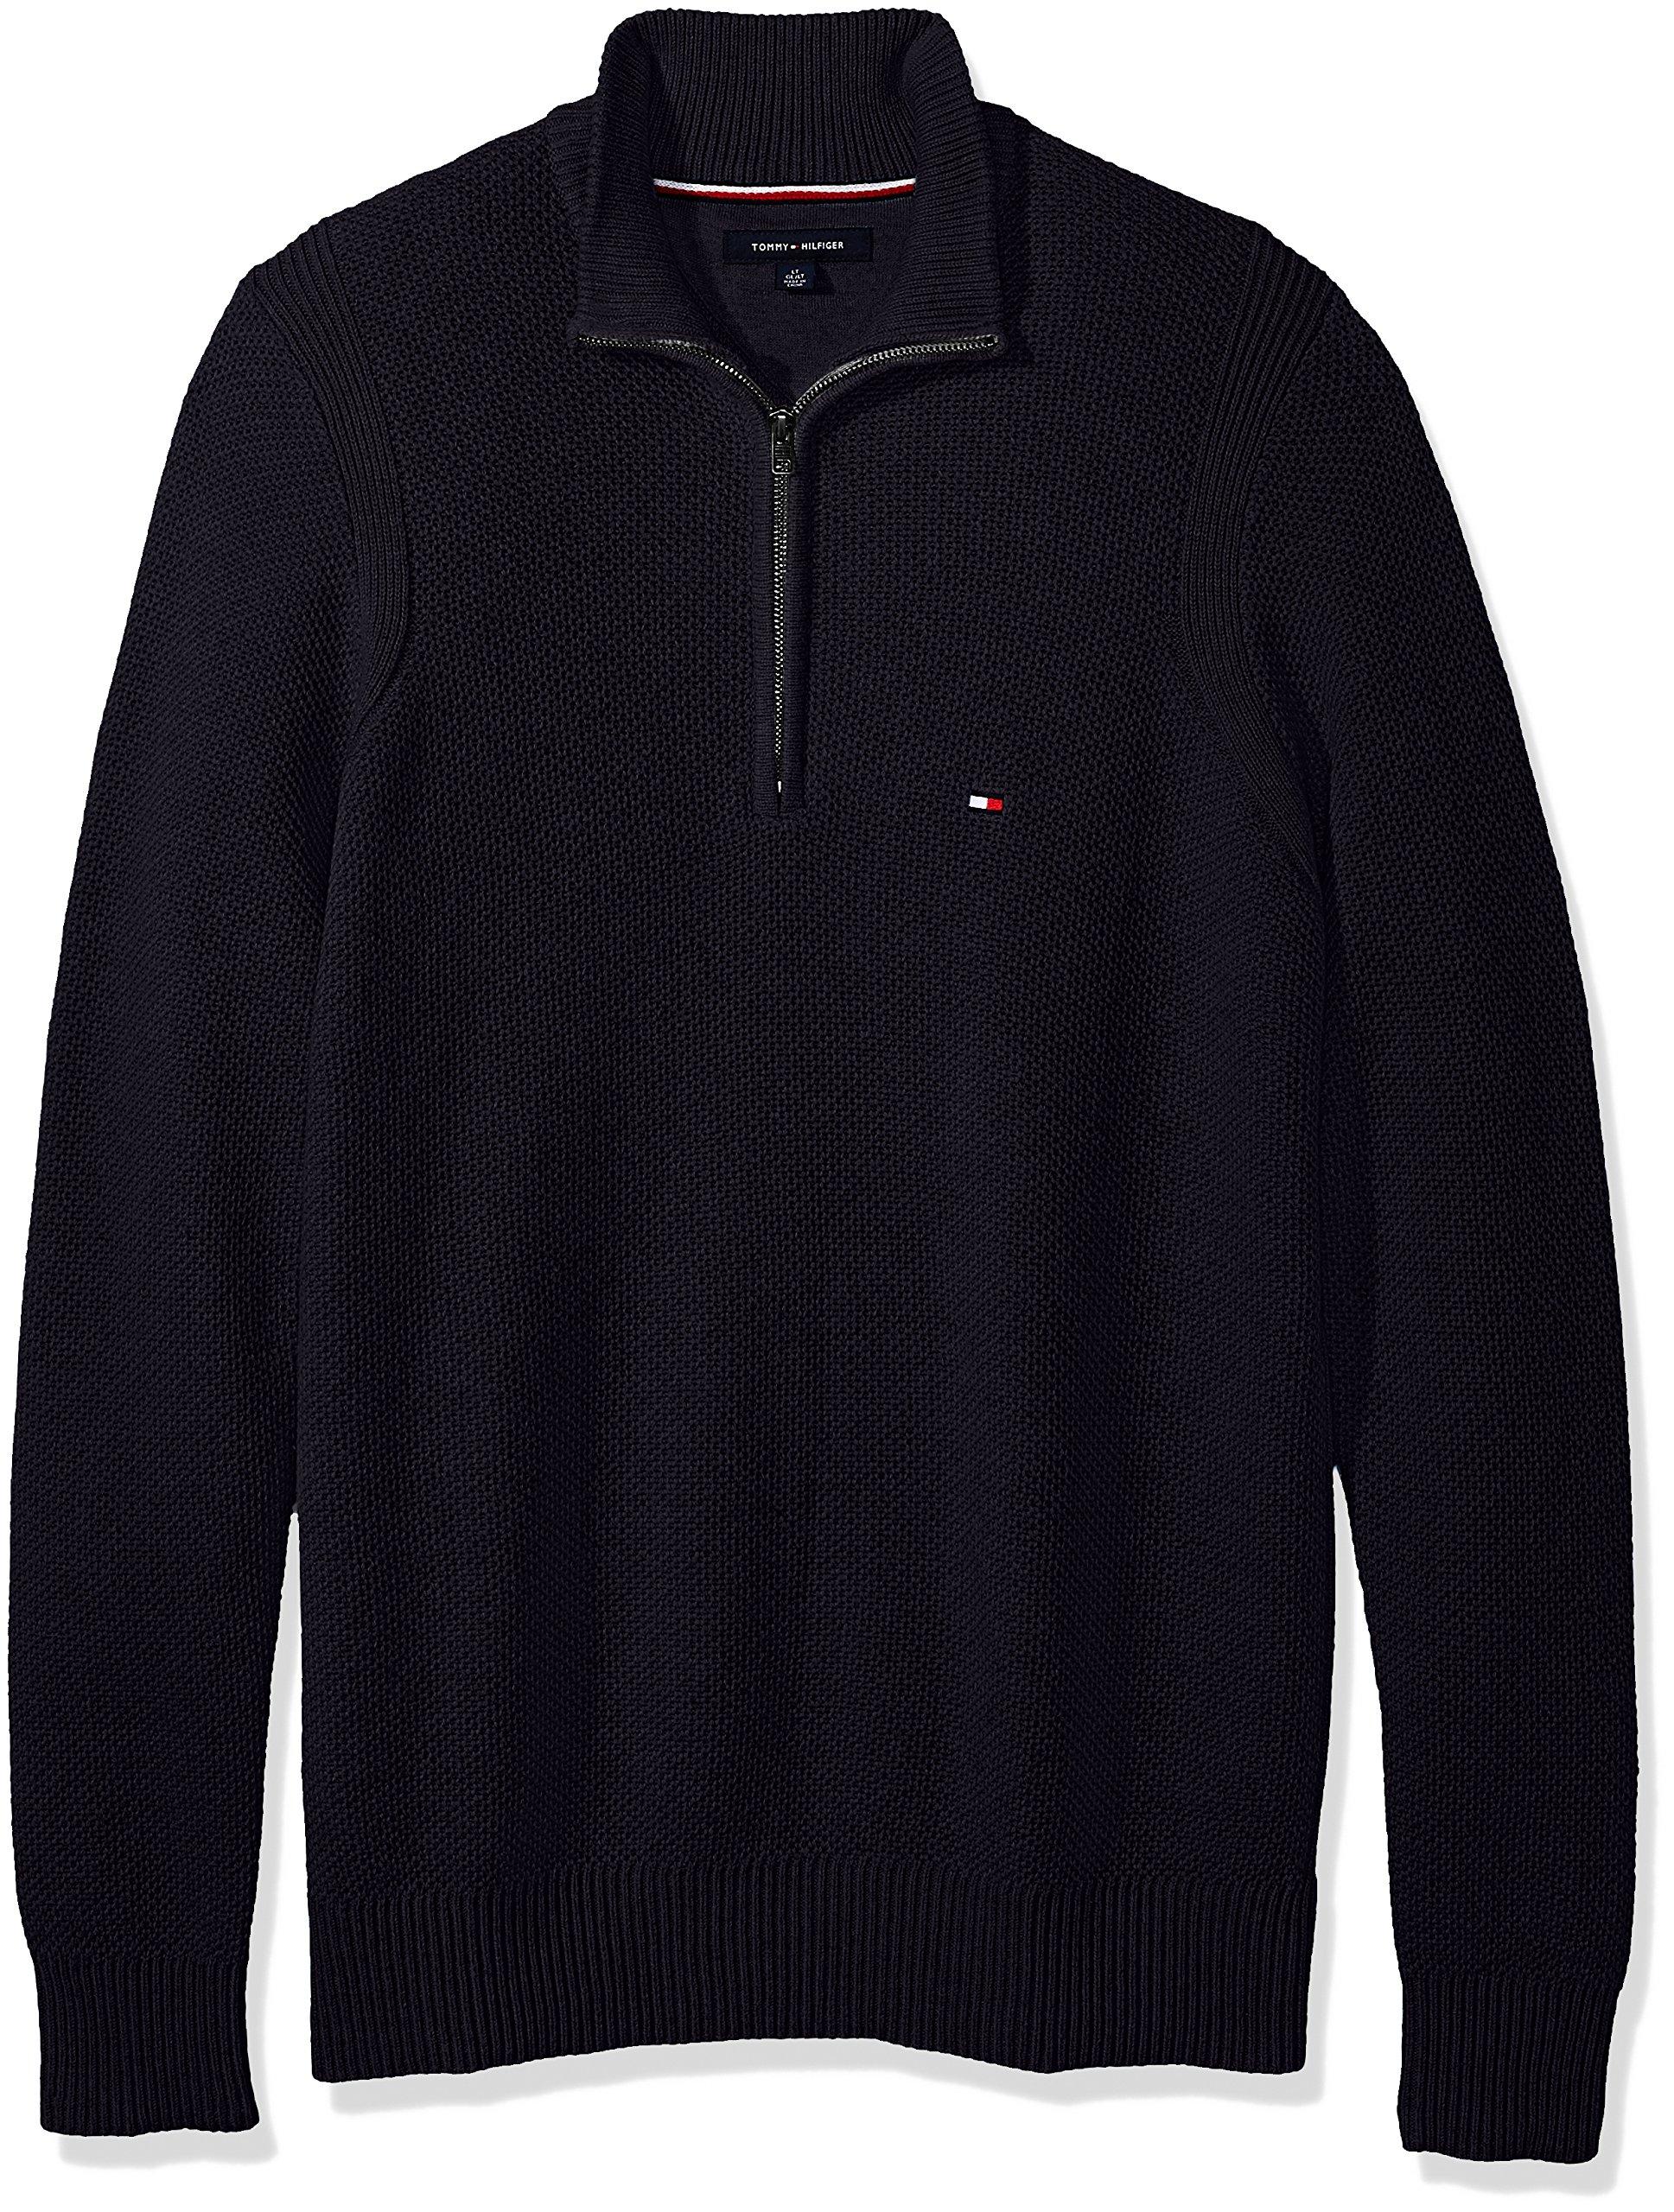 Tommy Hilfiger Men's Big and Tall 1/4 Zip Pullover Sweater, Midnight, BG-2XL